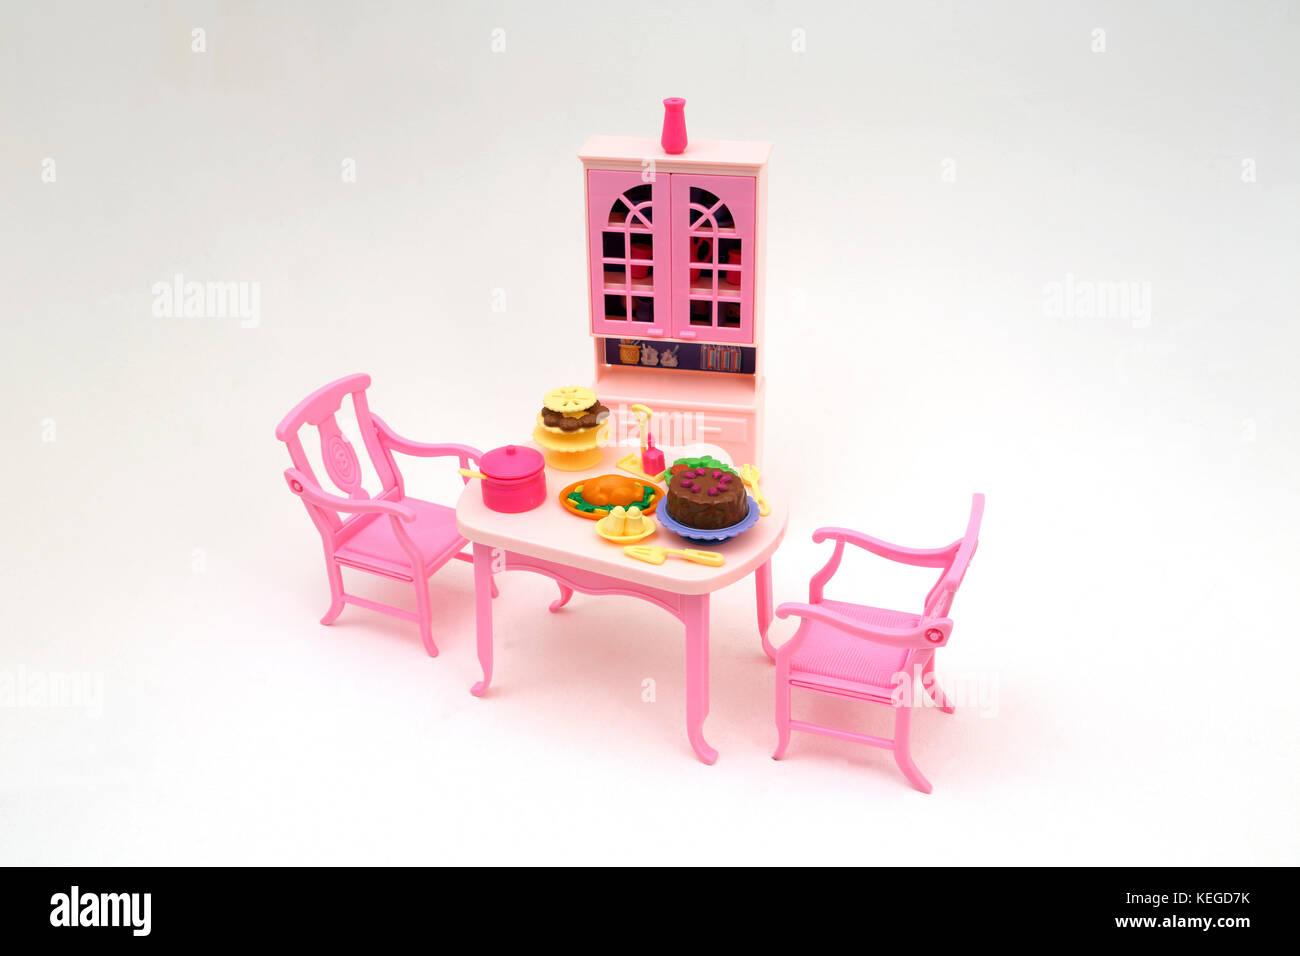 Barbie Toys Stock Photos & Barbie Toys Stock Images - Alamy